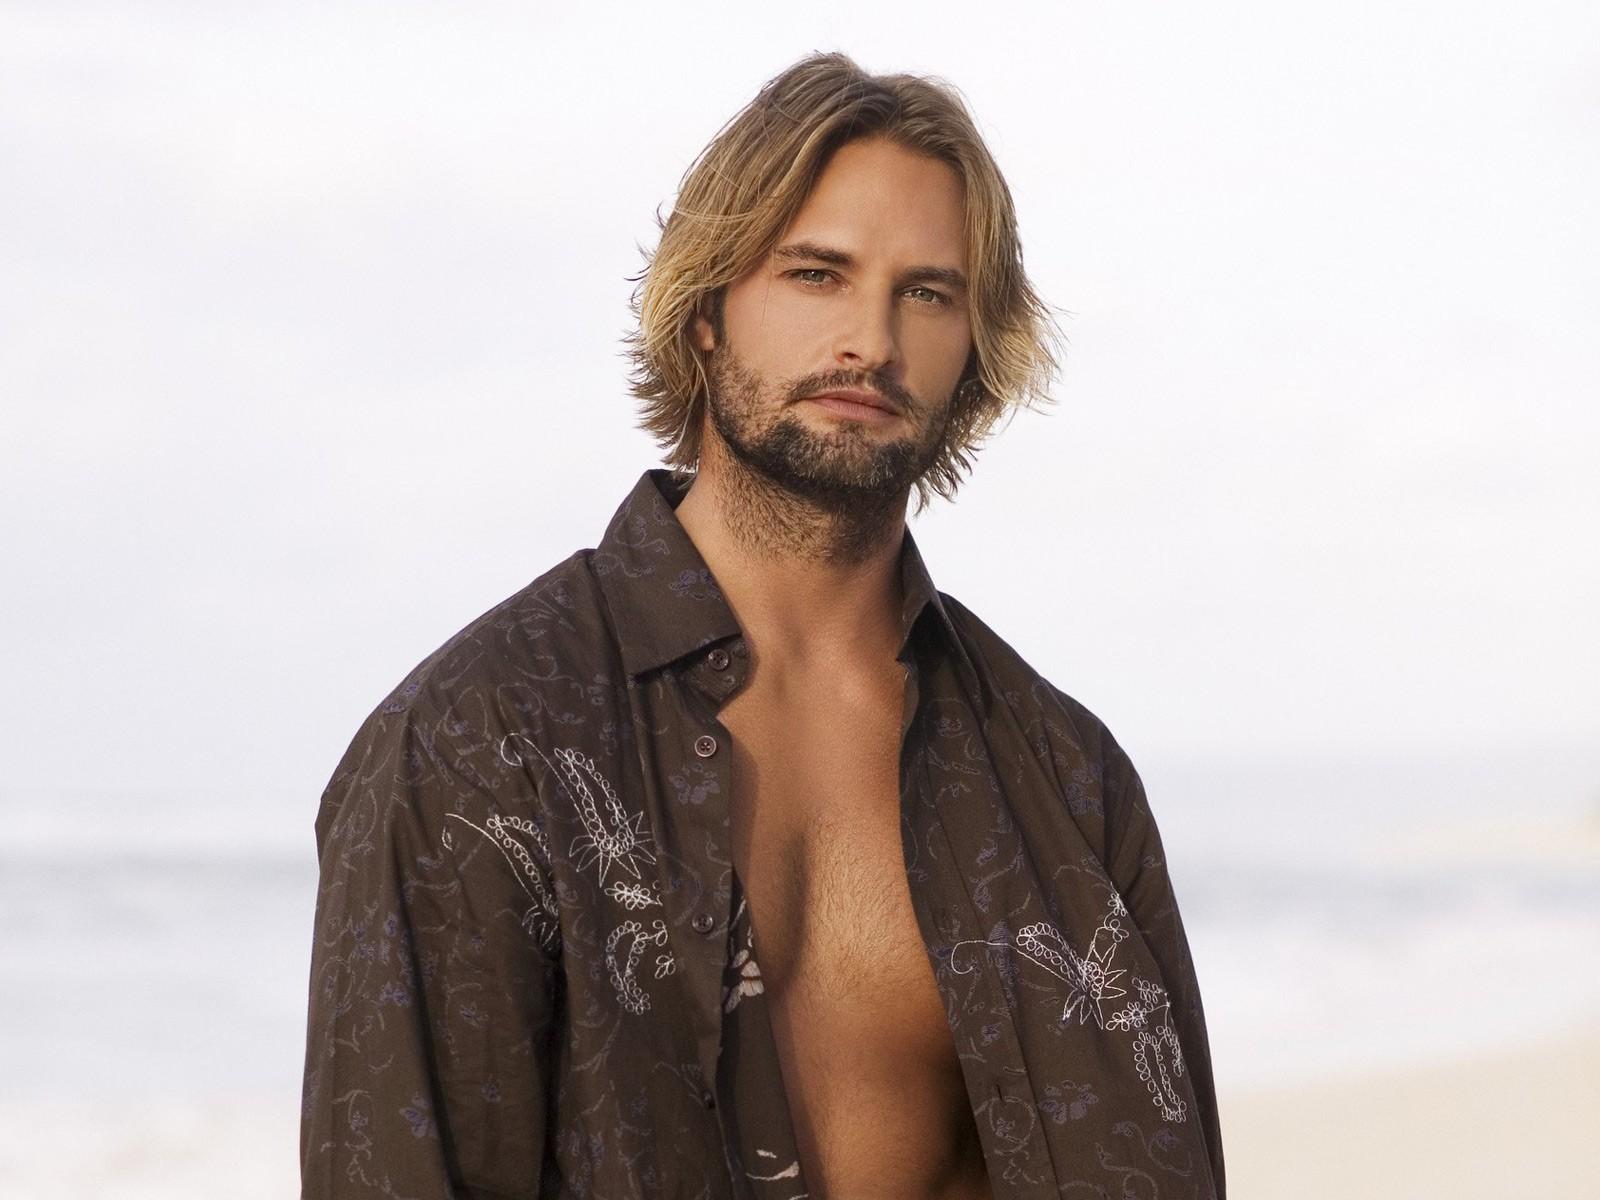 josh holloway american model actor joshua lee holloway